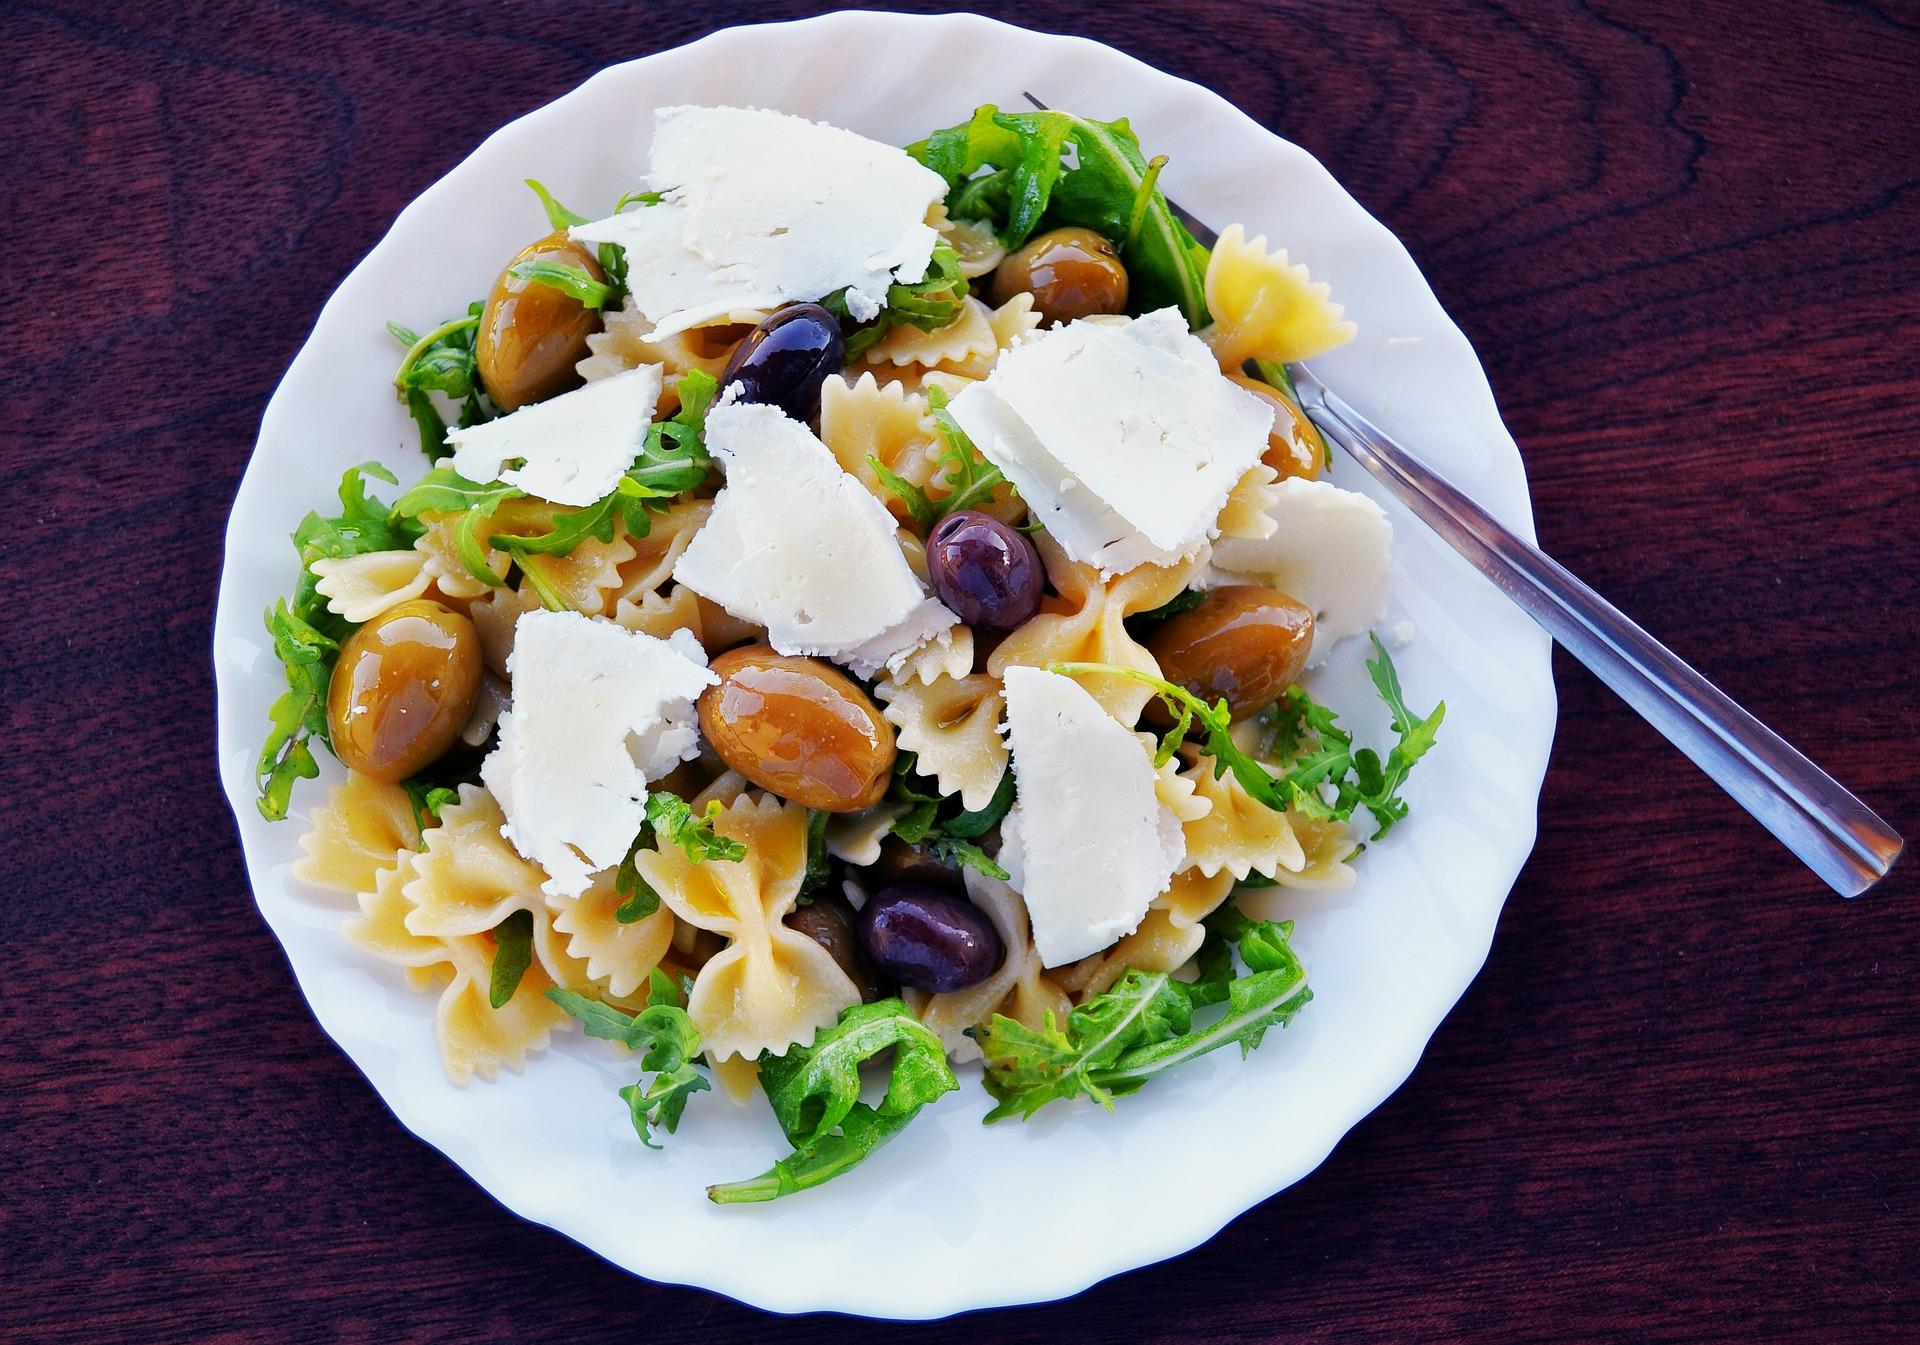 pasta-salad-1967501_1920